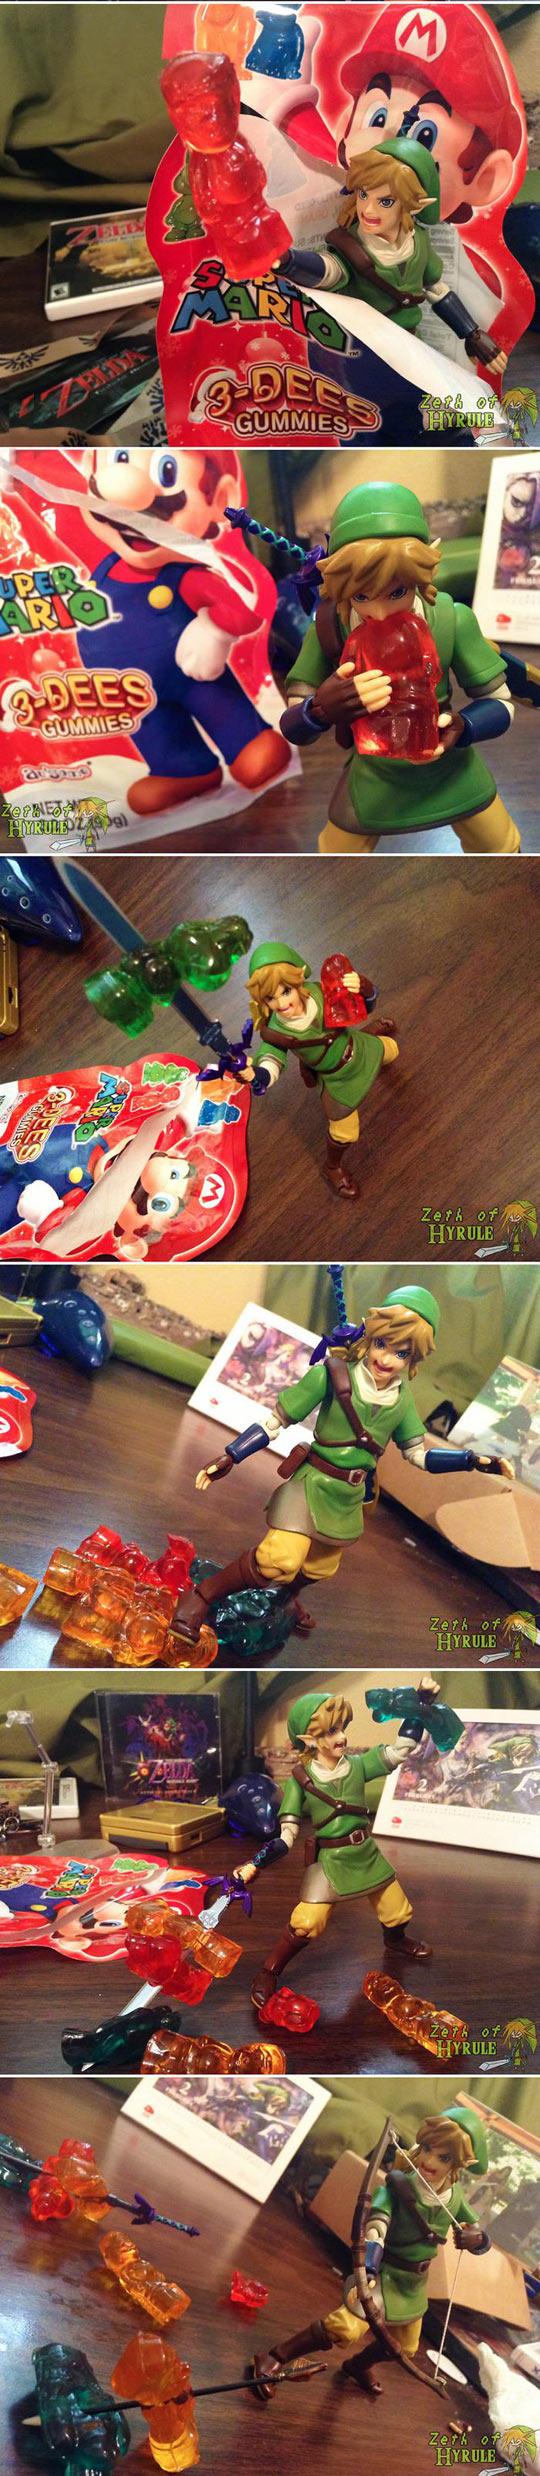 funny-Super-Mario-gummies-Link-fight